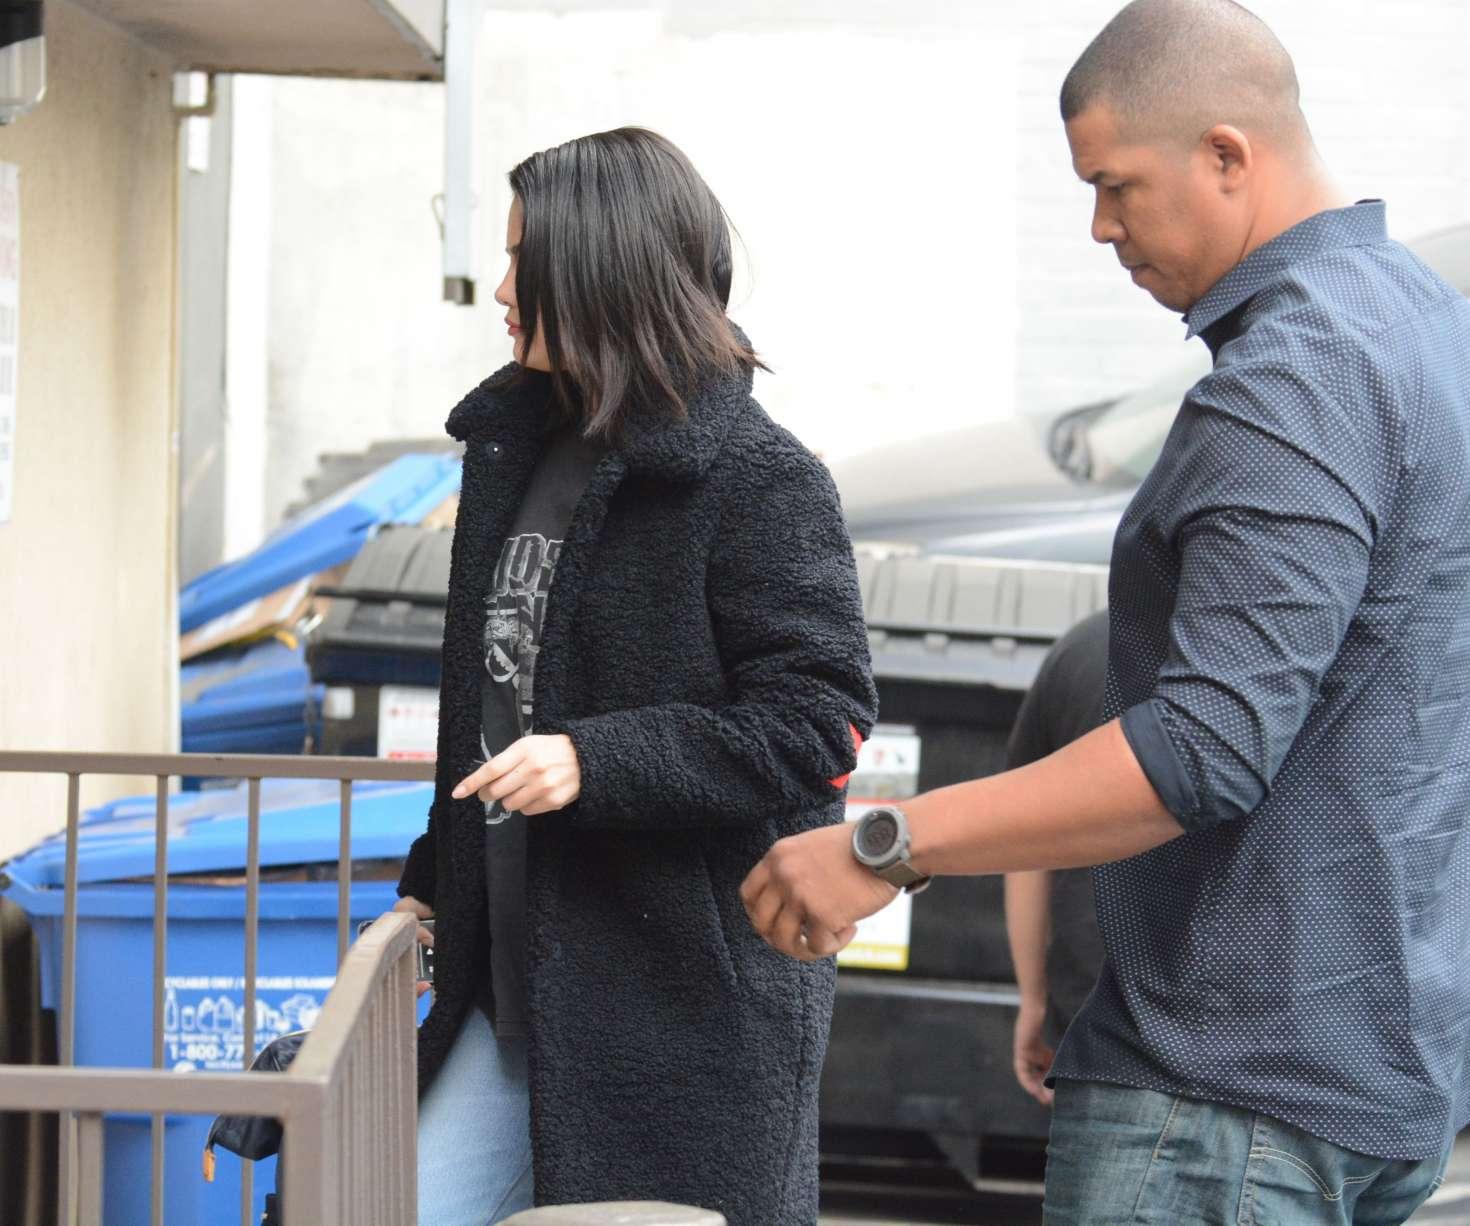 Selena Gomez 2019 : Selena Gomez: Arriving at a Music Studio -08